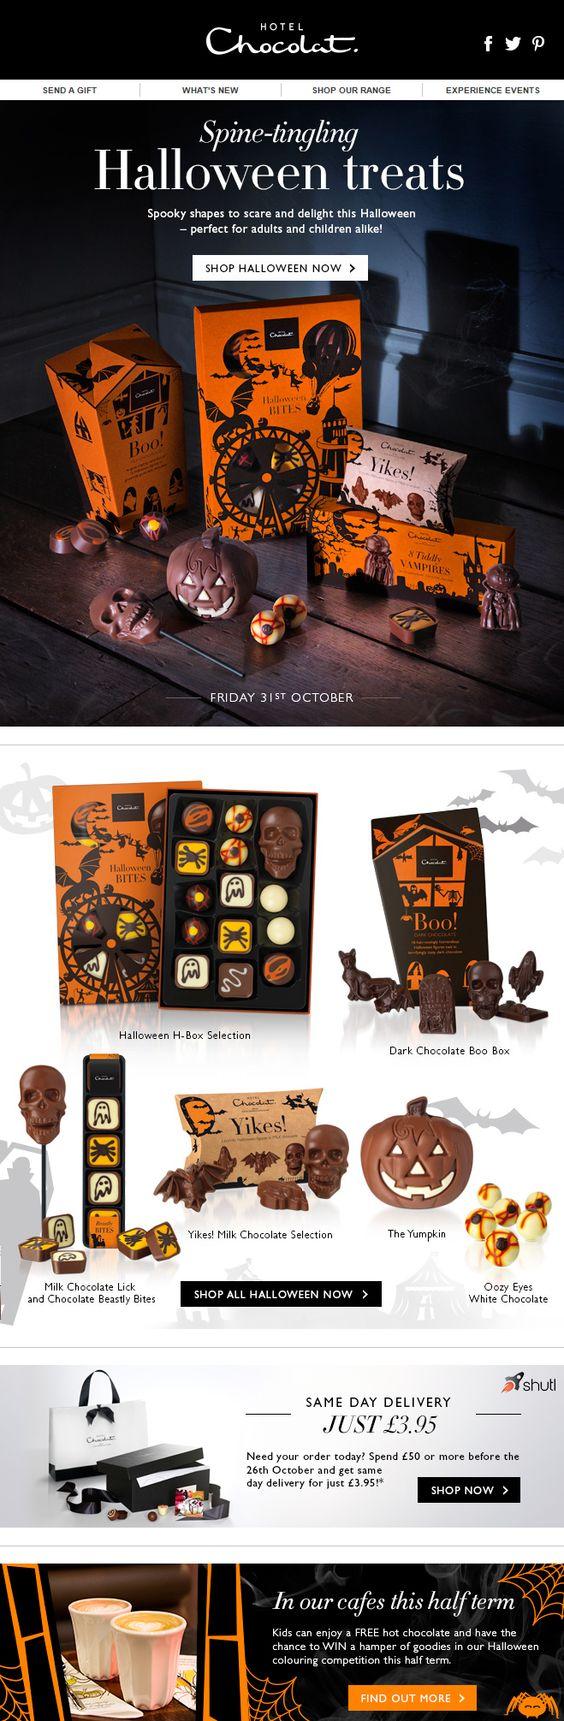 plantilla email halloween inspiracion hotel chocolat